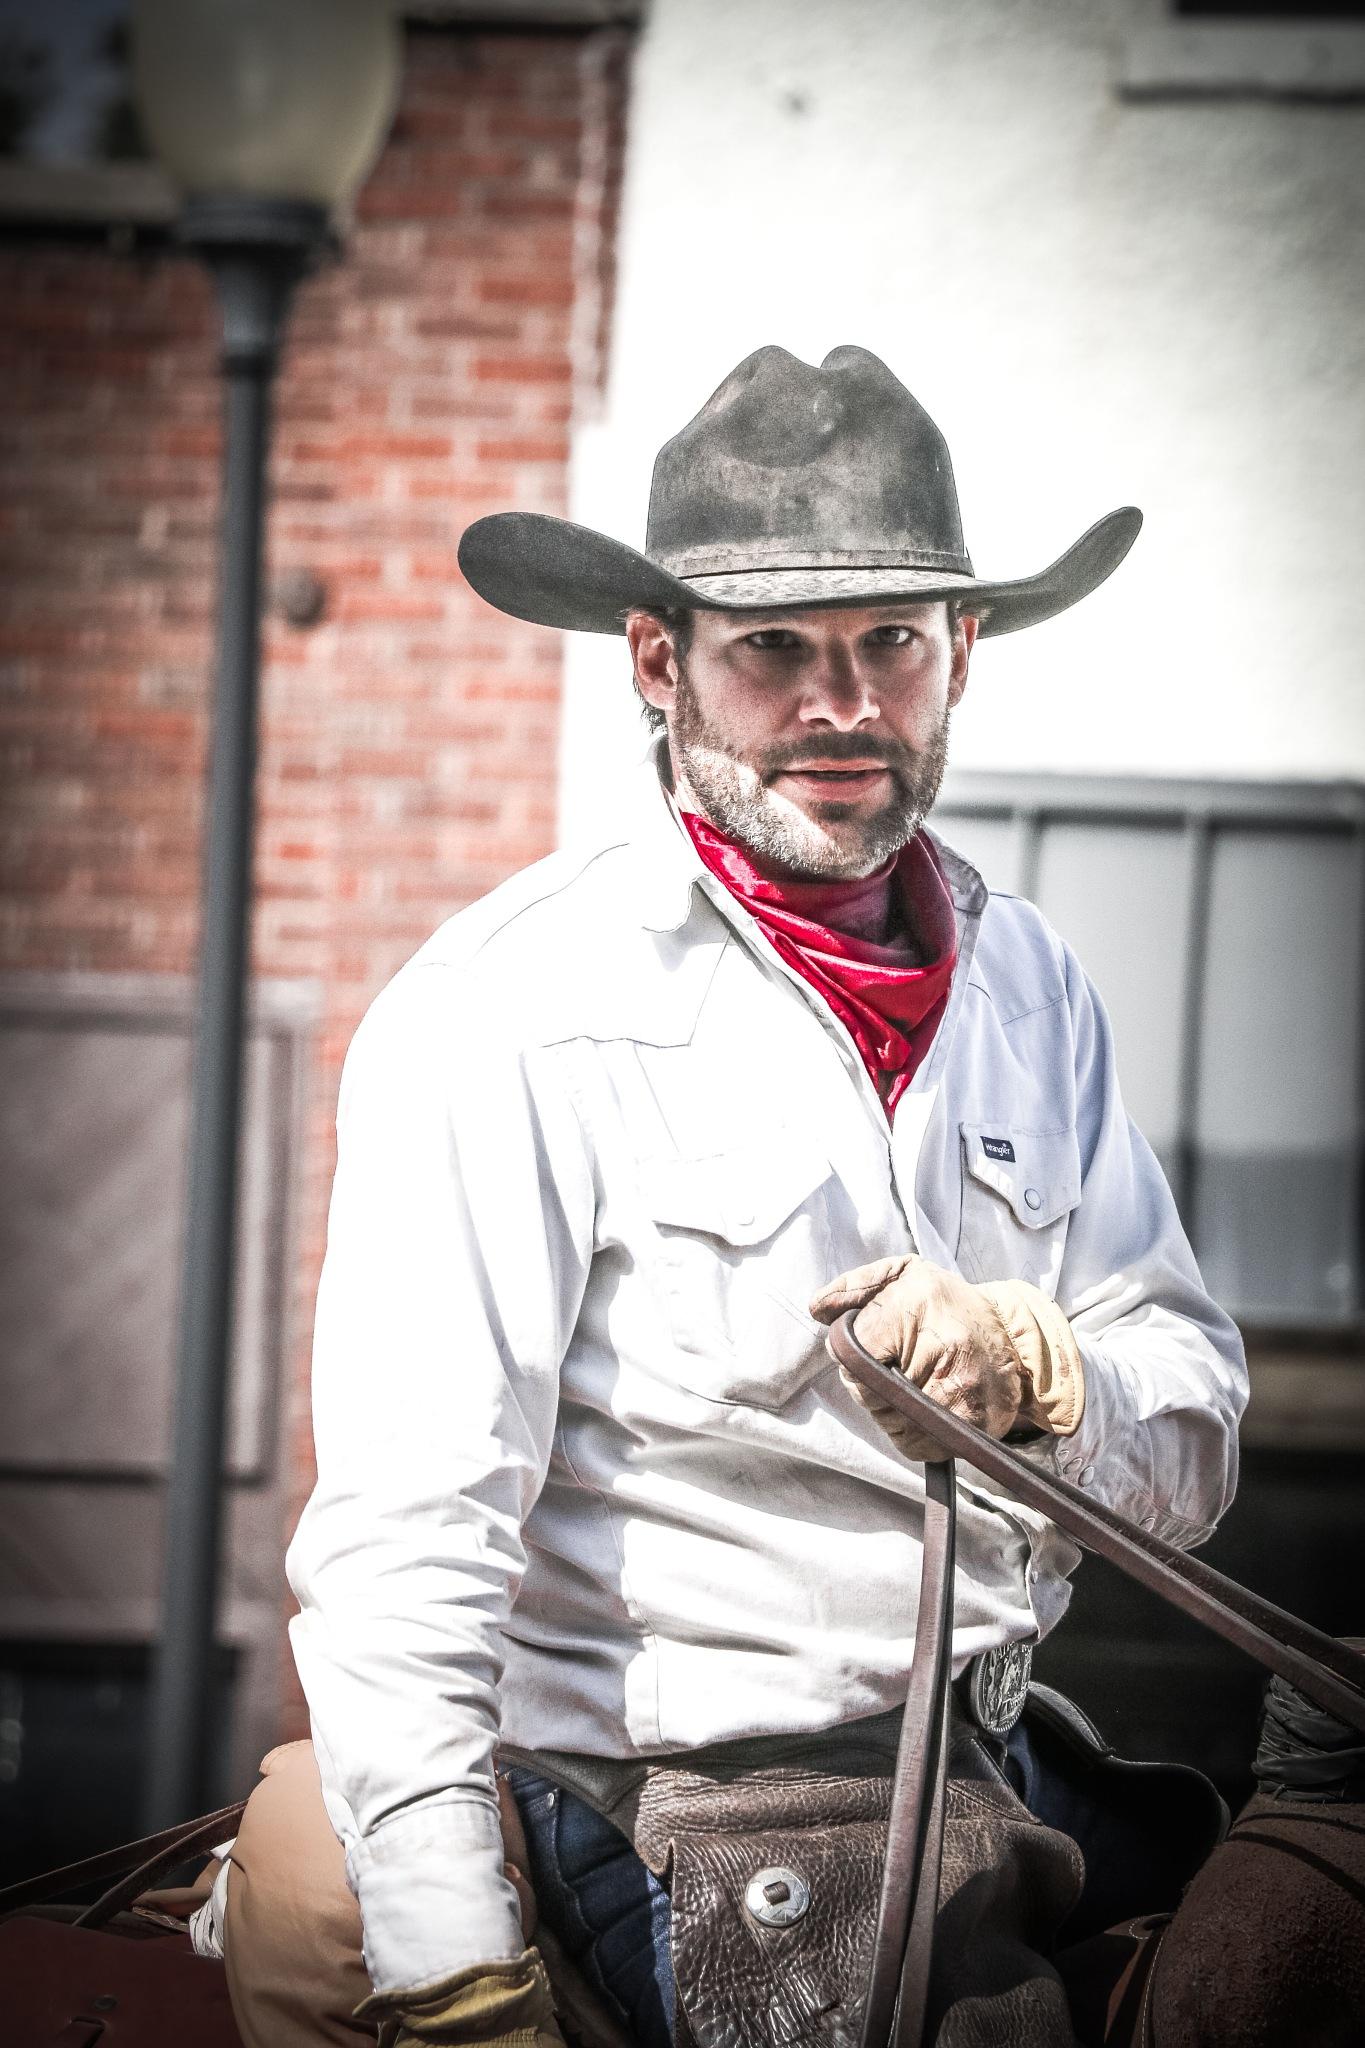 Hello Cowboy by Dixie L Colquhoun